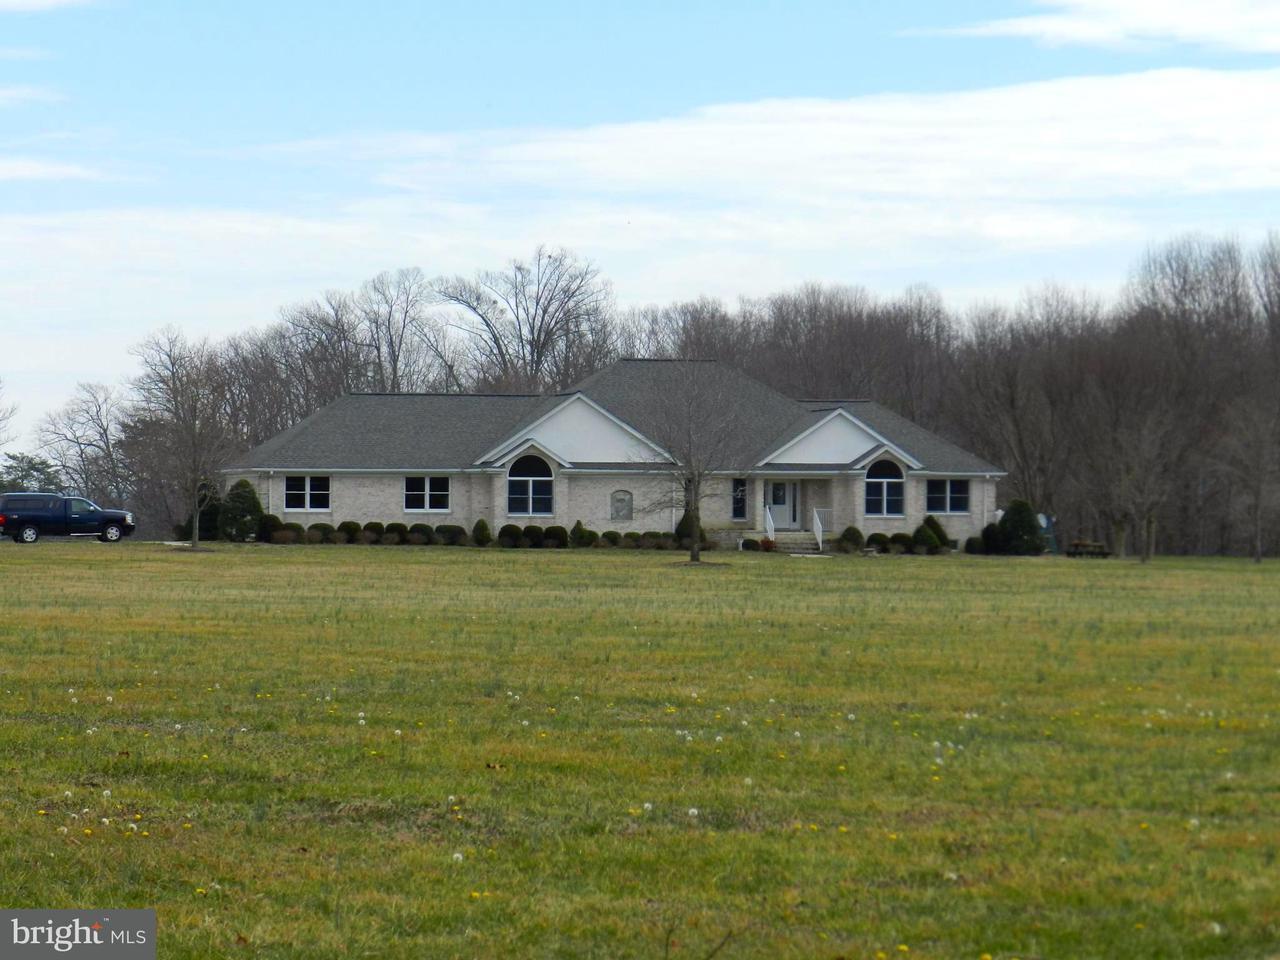 獨棟家庭住宅 為 出售 在 29305 EAGLE LANDING Lane 29305 EAGLE LANDING Lane Port Royal, 弗吉尼亞州 22535 美國